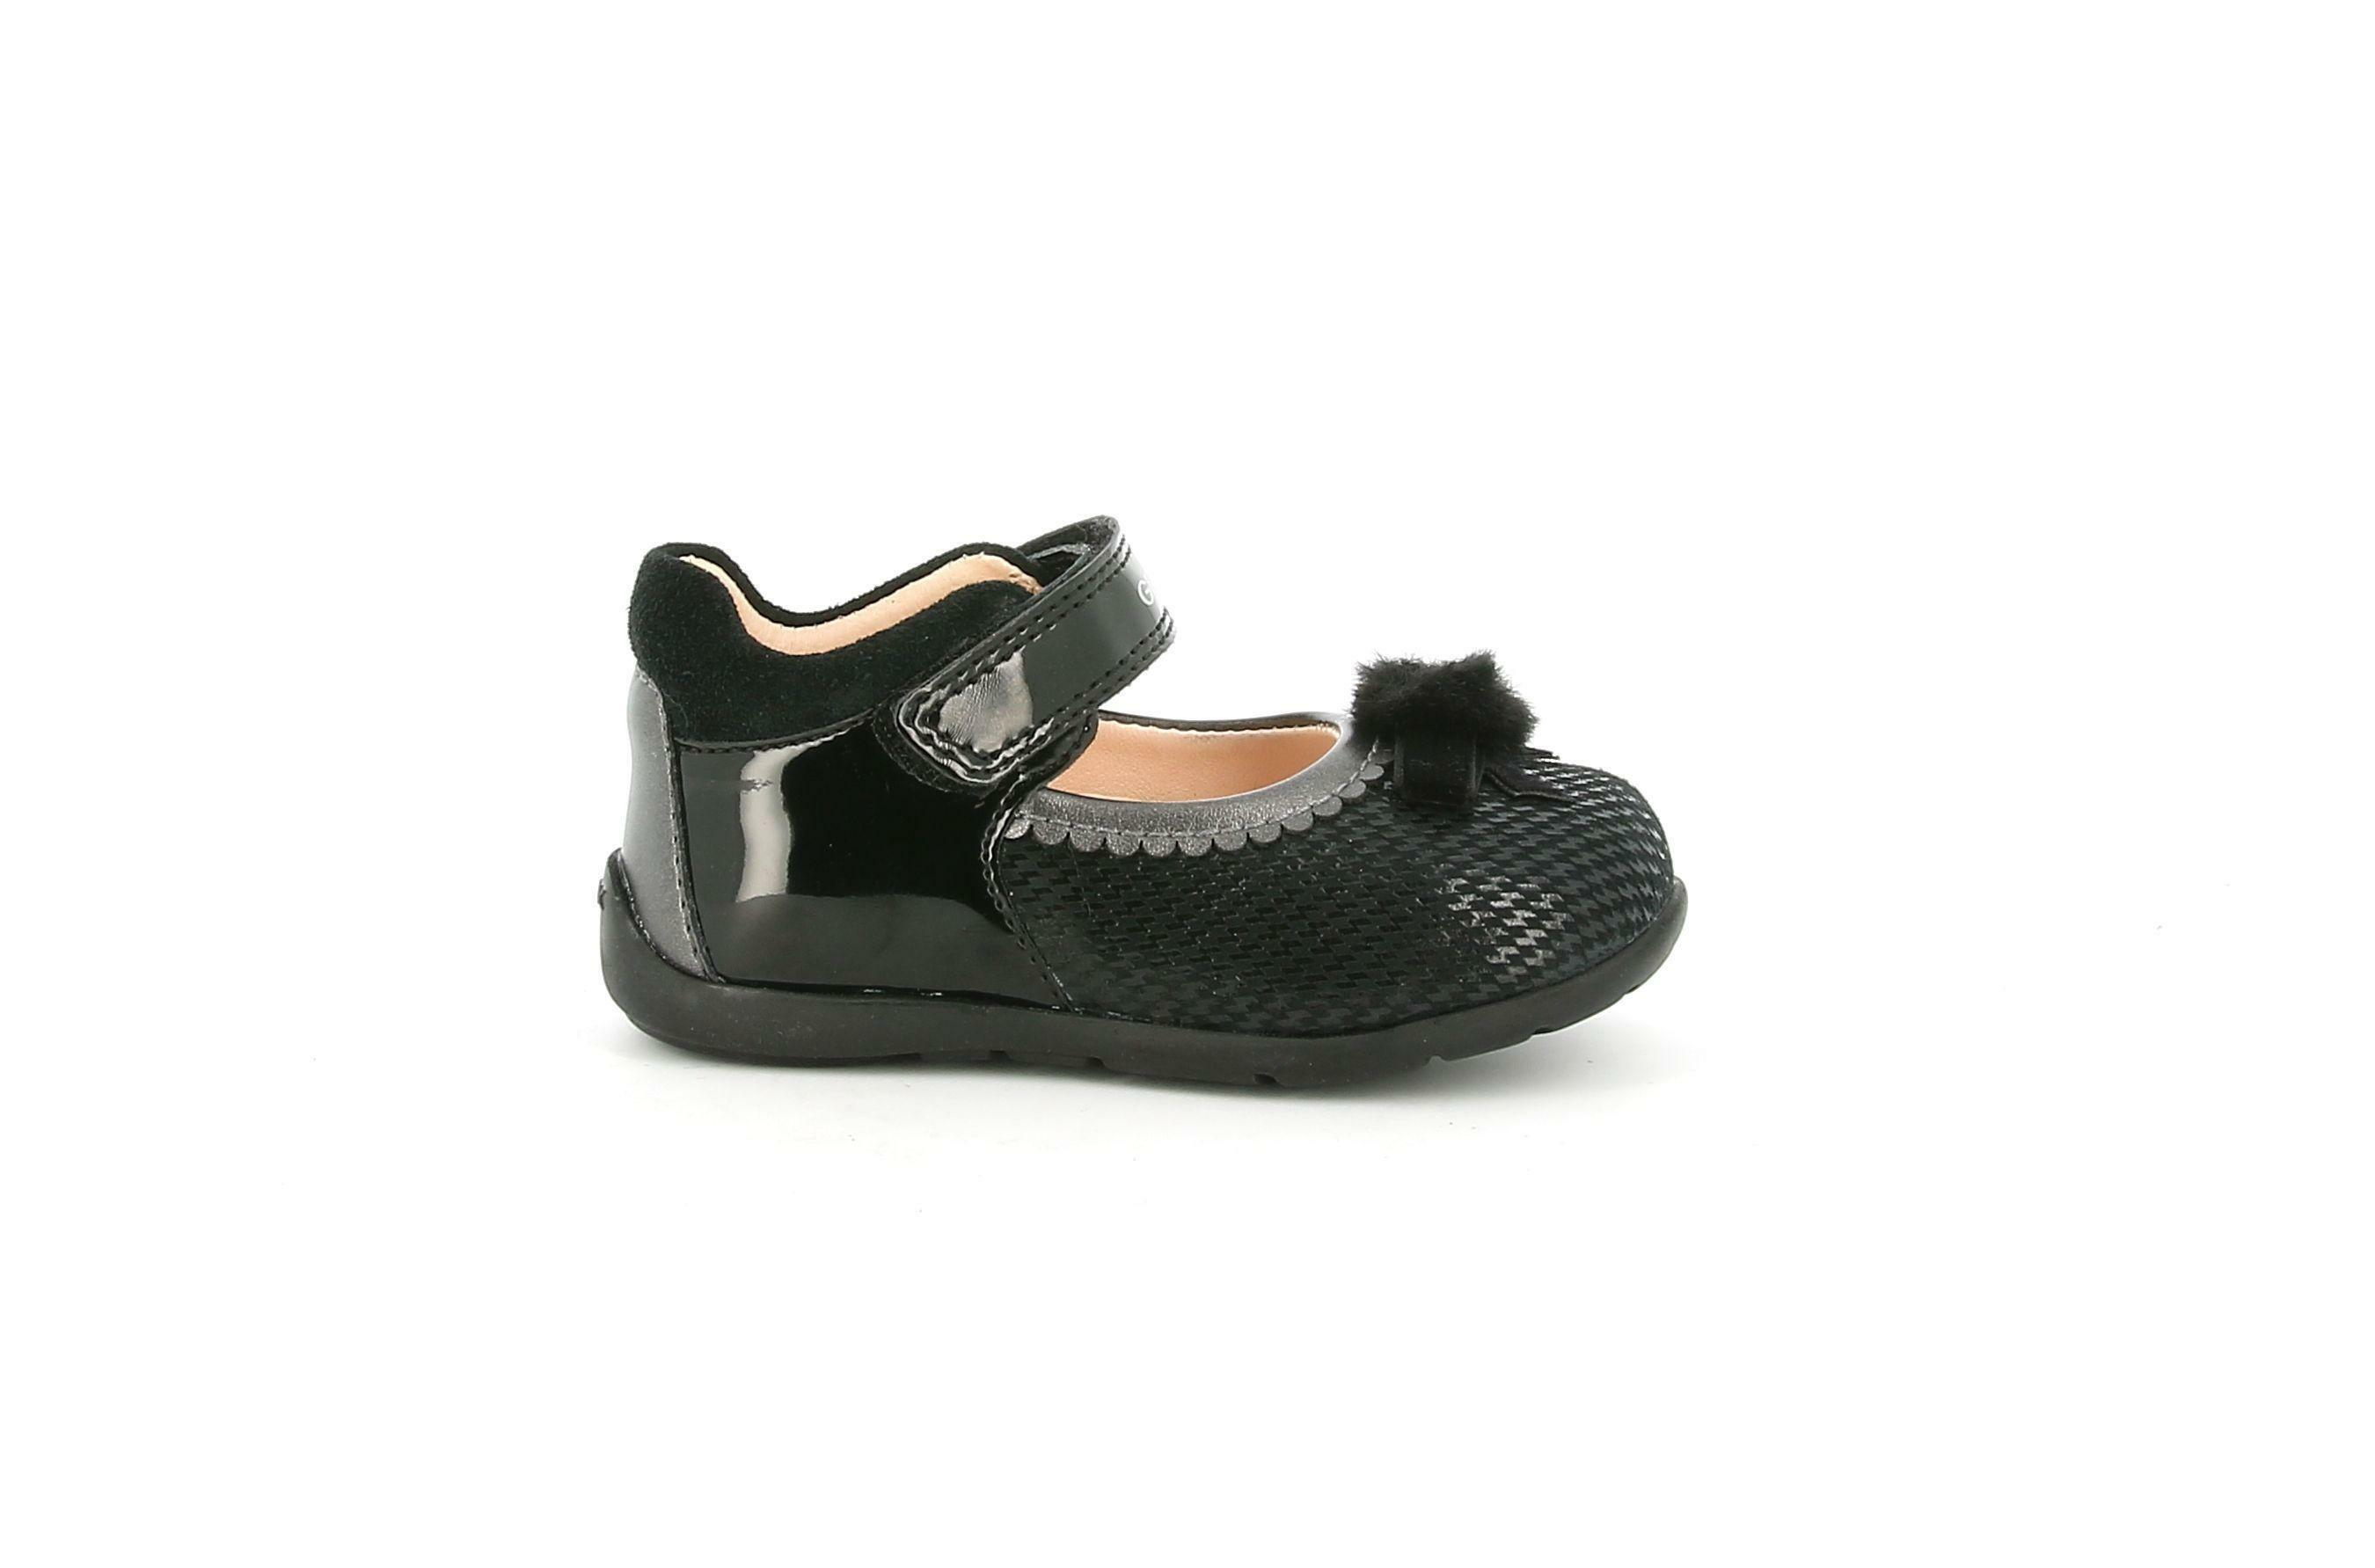 geox geox b0451c 0manf c9999 black ballerina bimba